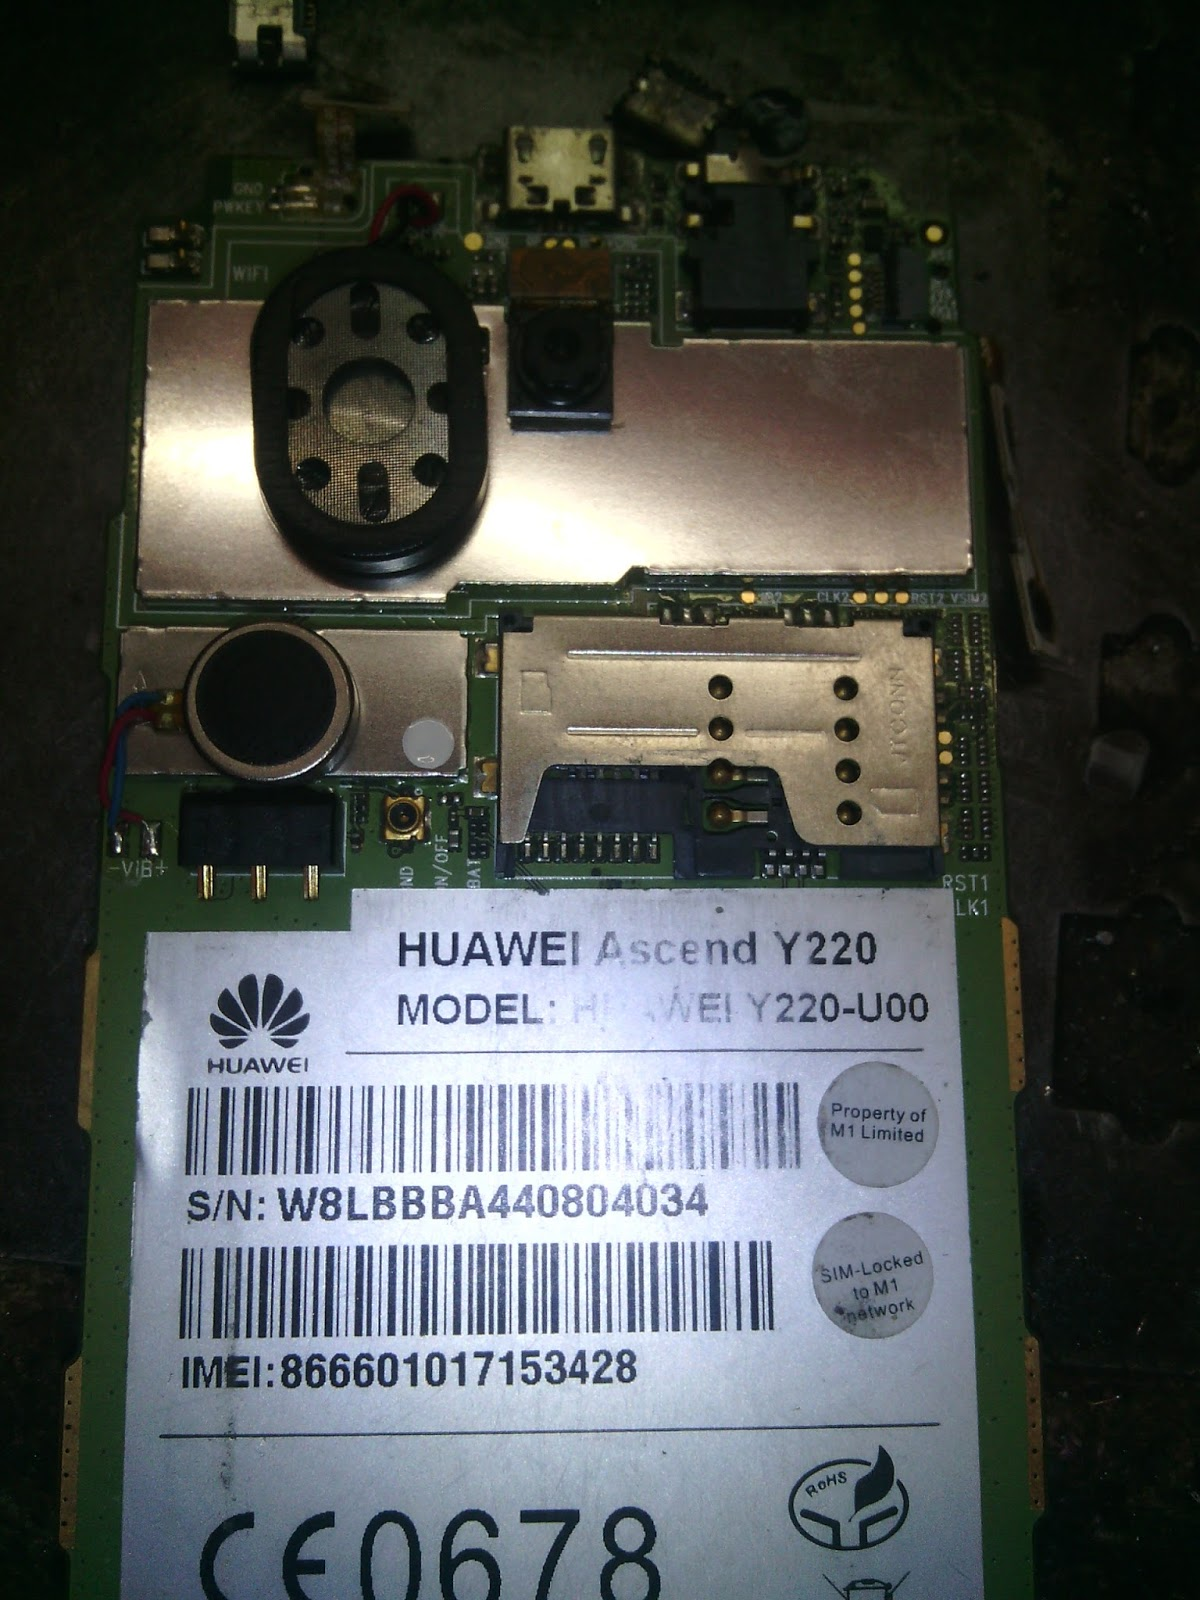 Mobile Hospital Gaibandha: HUAWEI Y220-U00 Firmware & Flash File